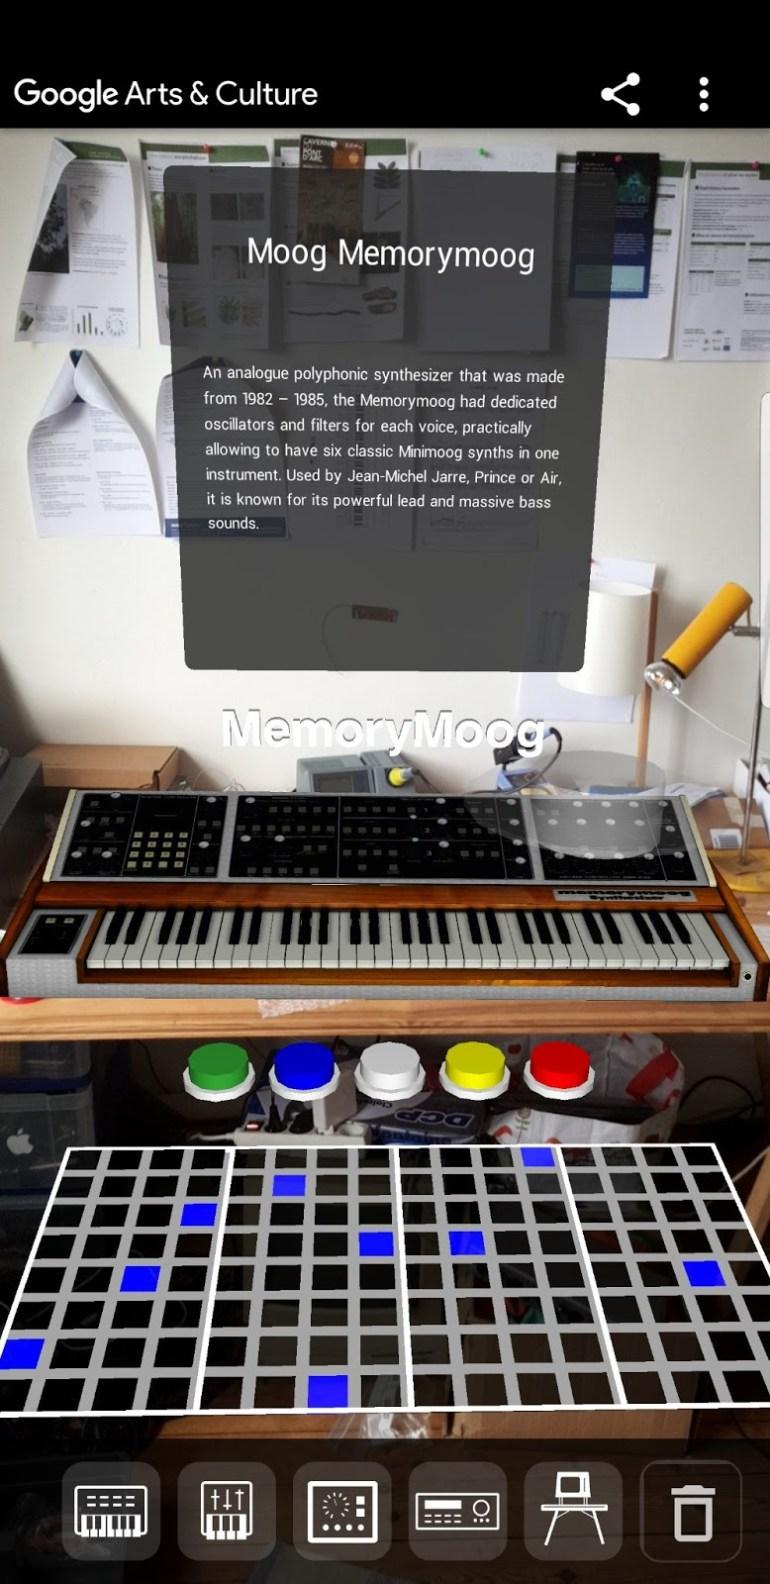 Google Arts & Culture та YouTube створили Music, Makers & Machines — онлайн-екскурсію по історії електронної музики